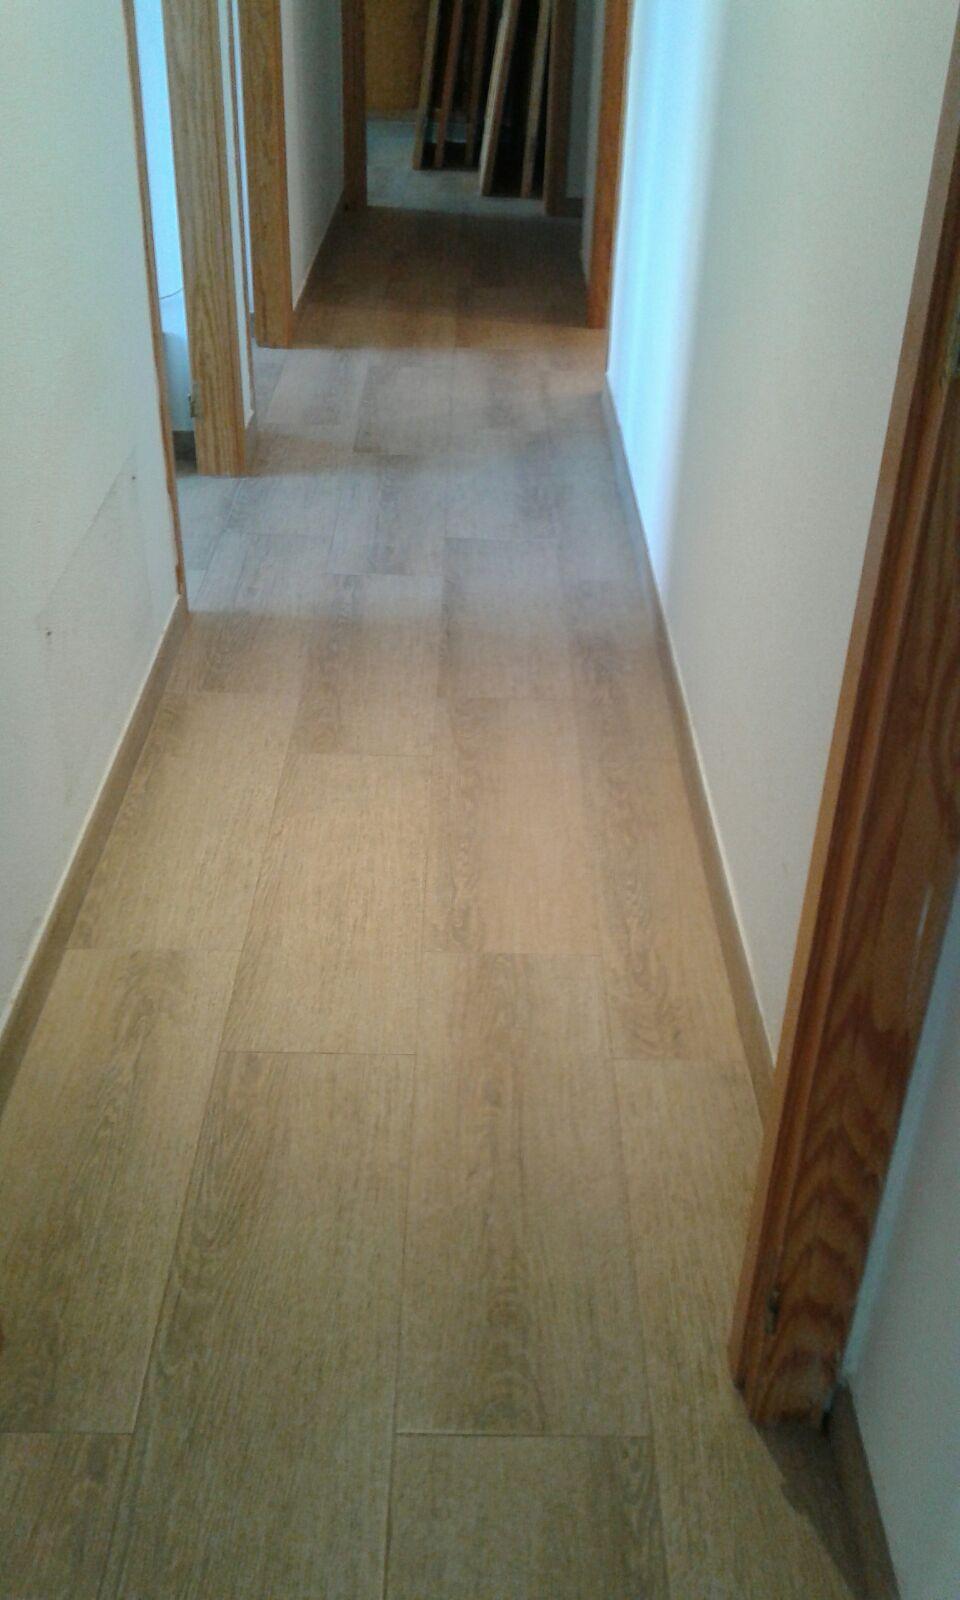 Colocacion suelo porcelanico imitacion madera stunning great porcelanico imitacion madera - Suelo porcelanico imitacion madera ...